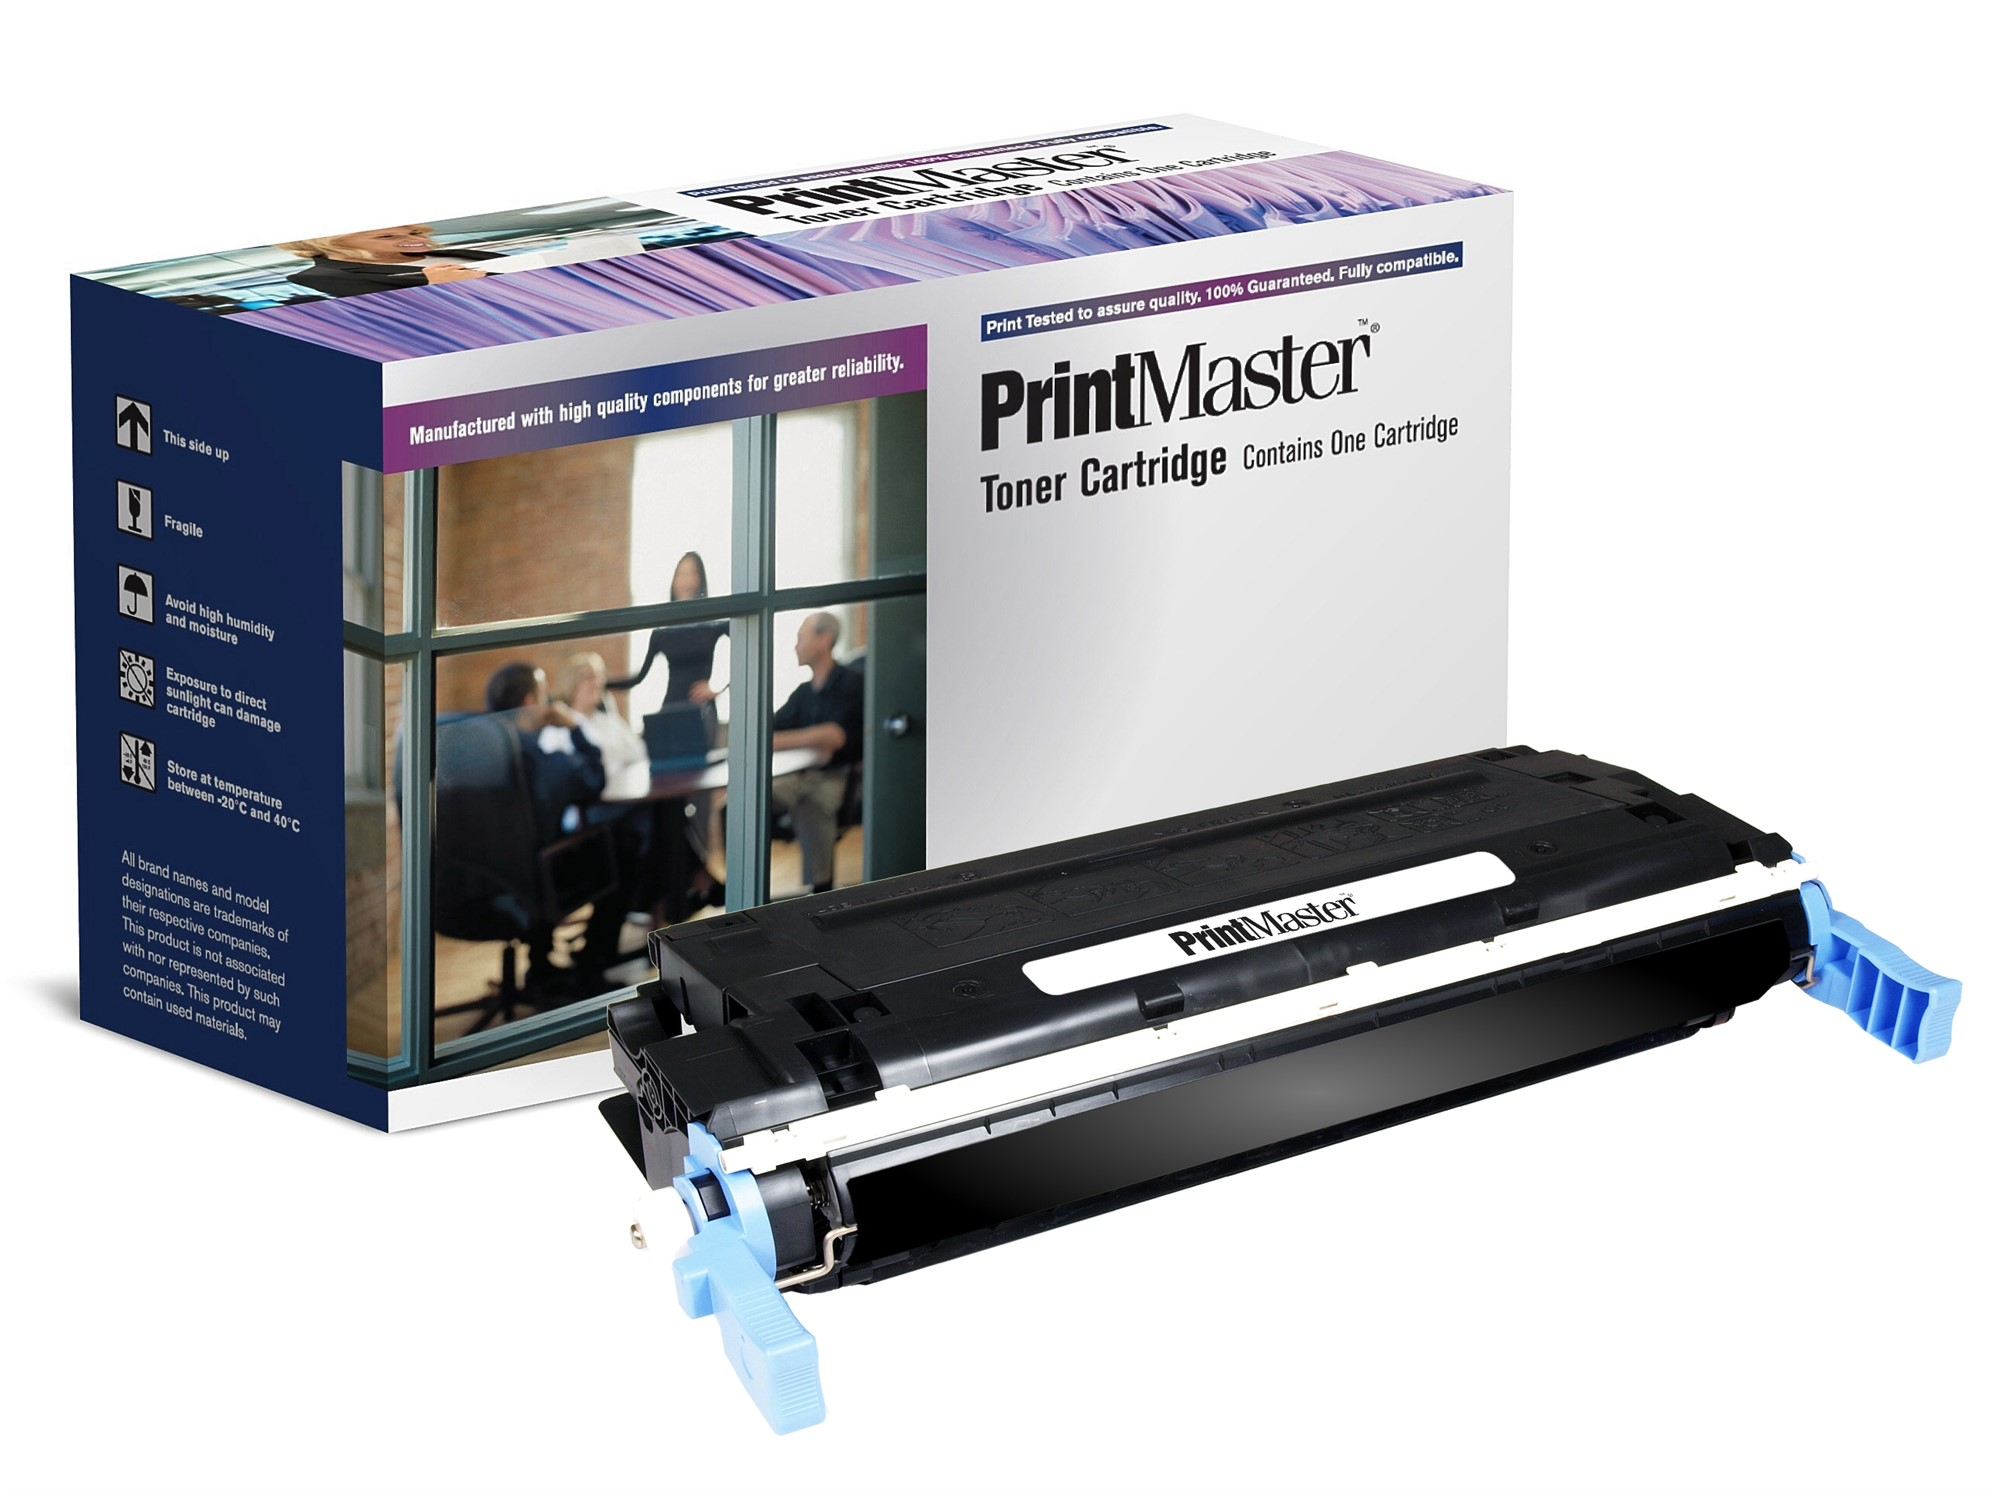 PrintMaster 4600/4650 Black Toner C9720A